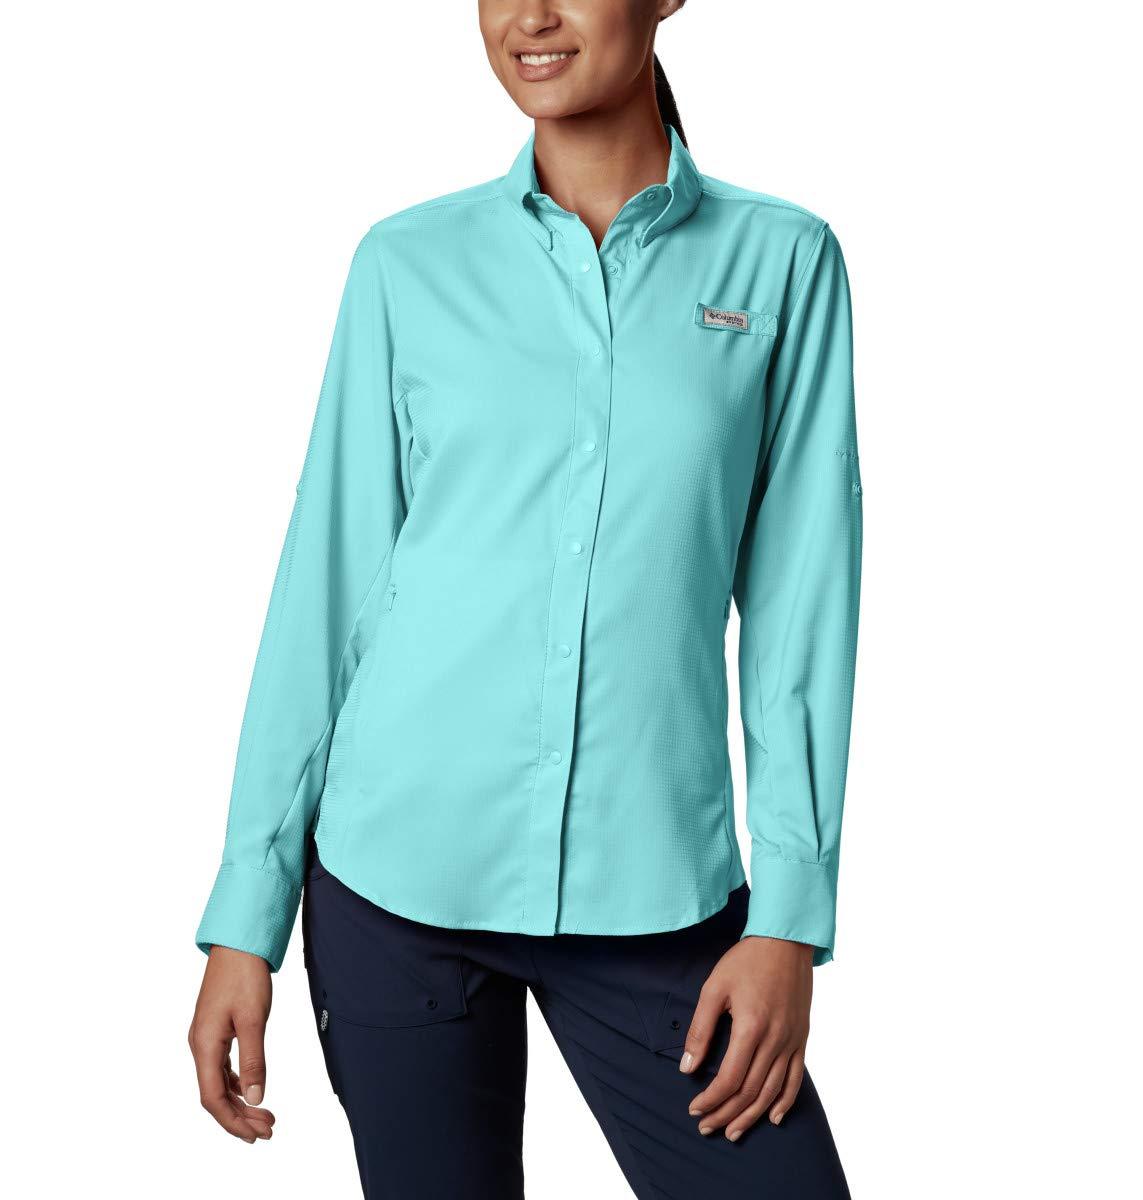 Columbia Women's PFG Tamiami II Long Sleeve Shirt , Clear Blue, X-Small by Columbia